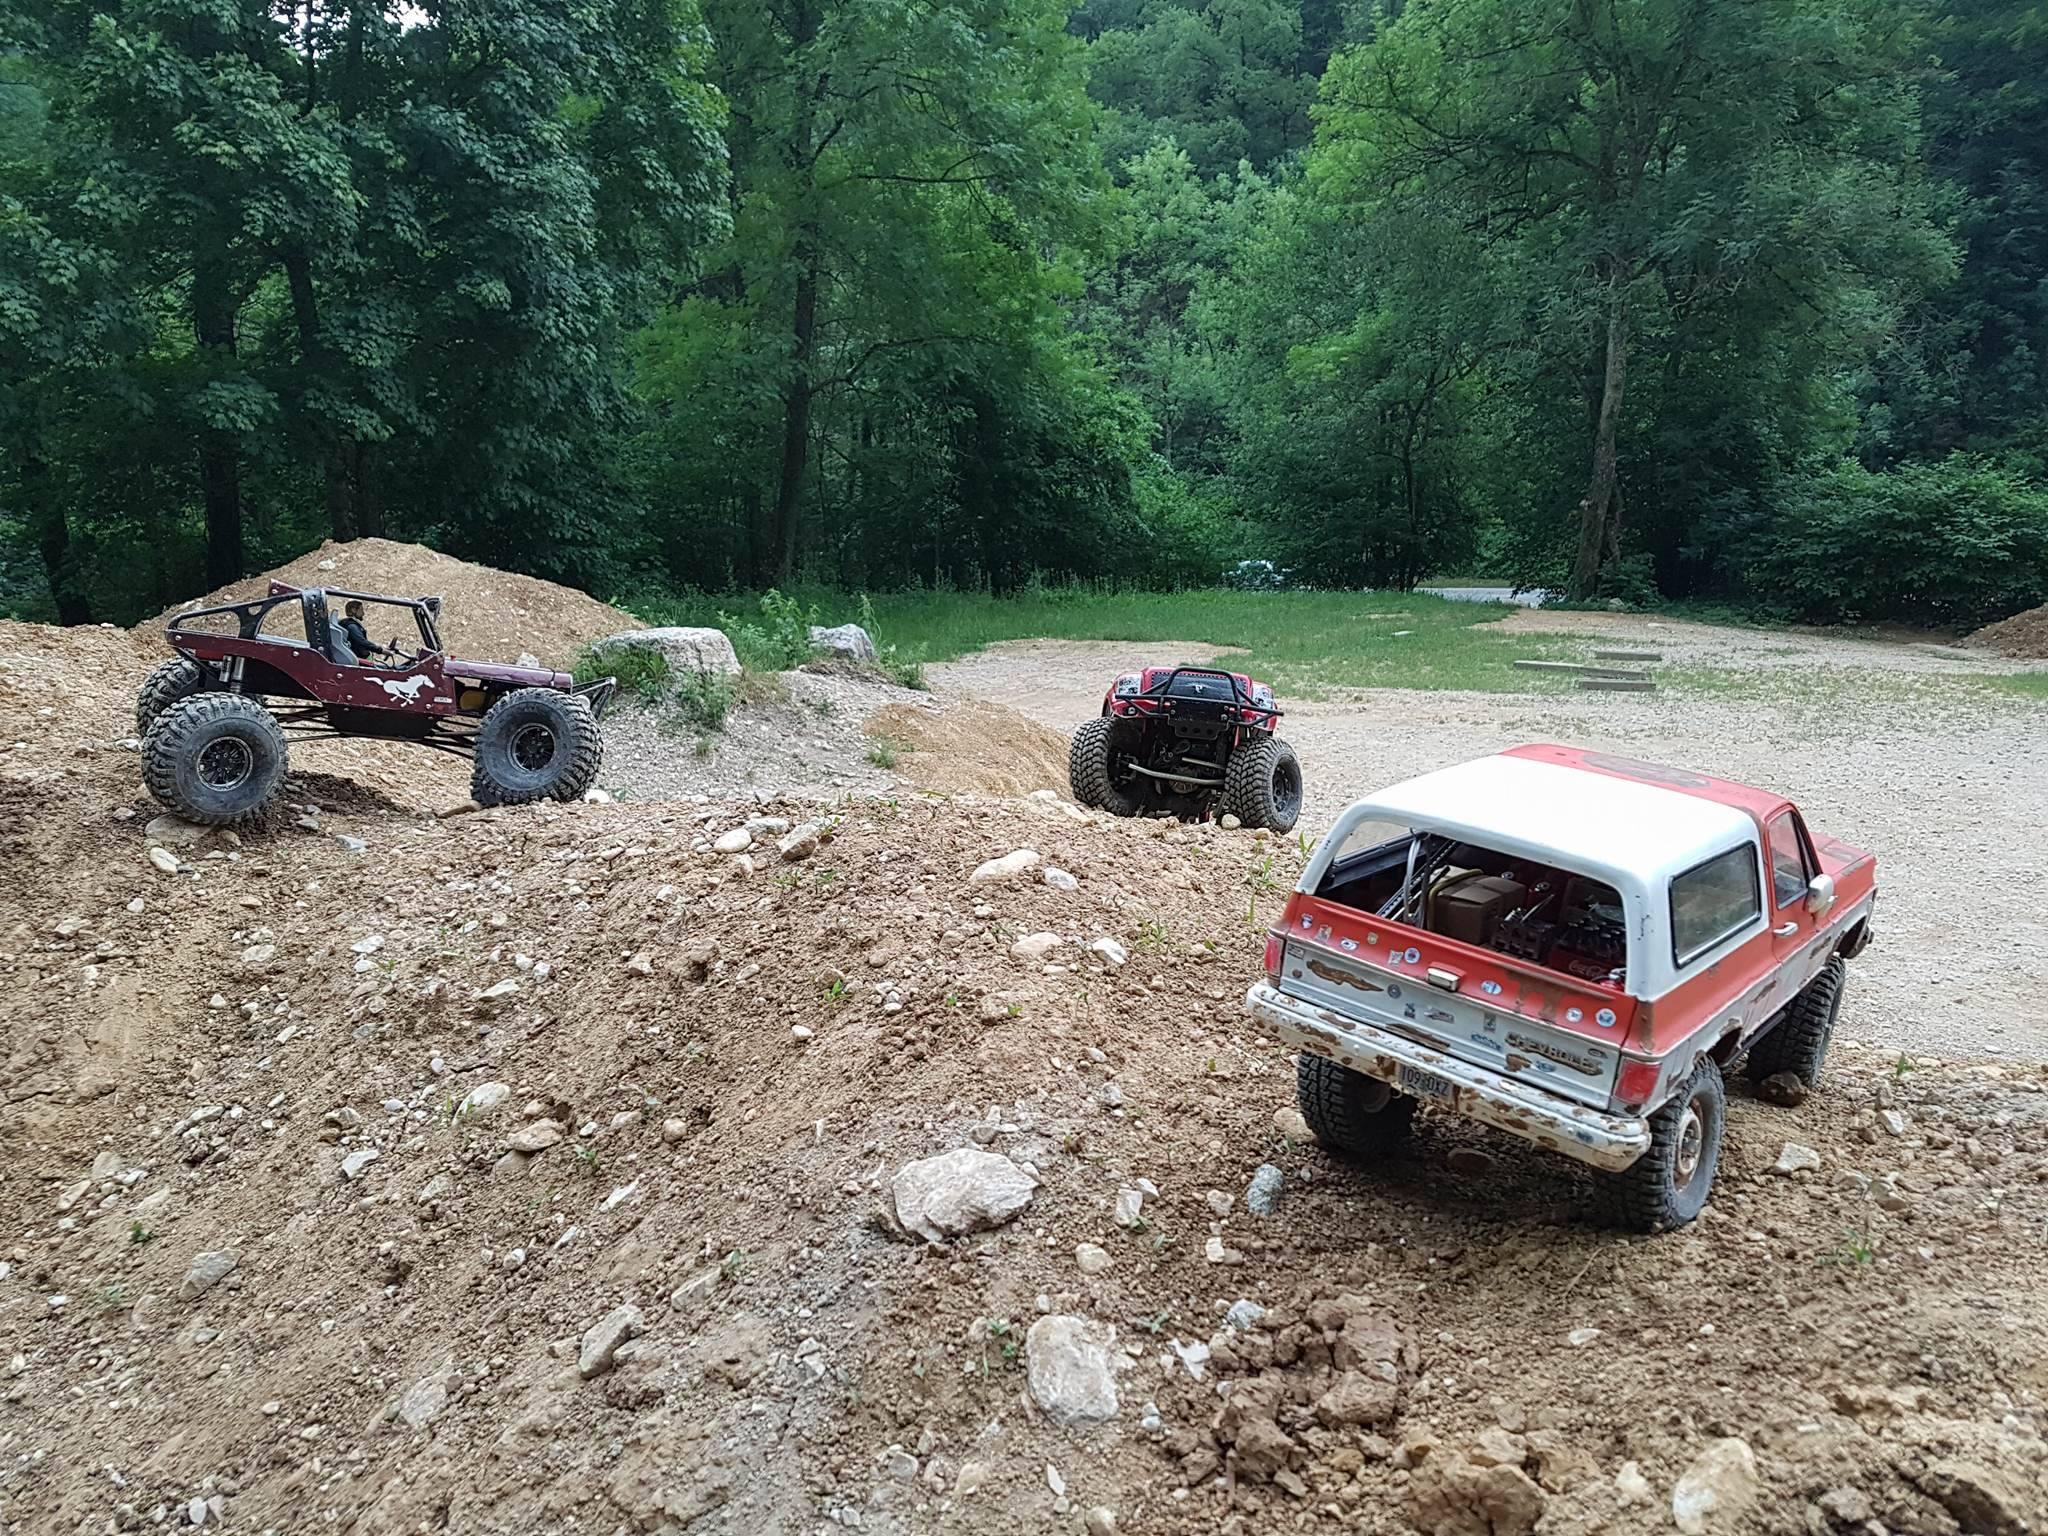 Farm Truck Chevrolet Blazer K5 sur TF2, Road Trip ! - Page 3 9341111936912713034322764419791963311528o